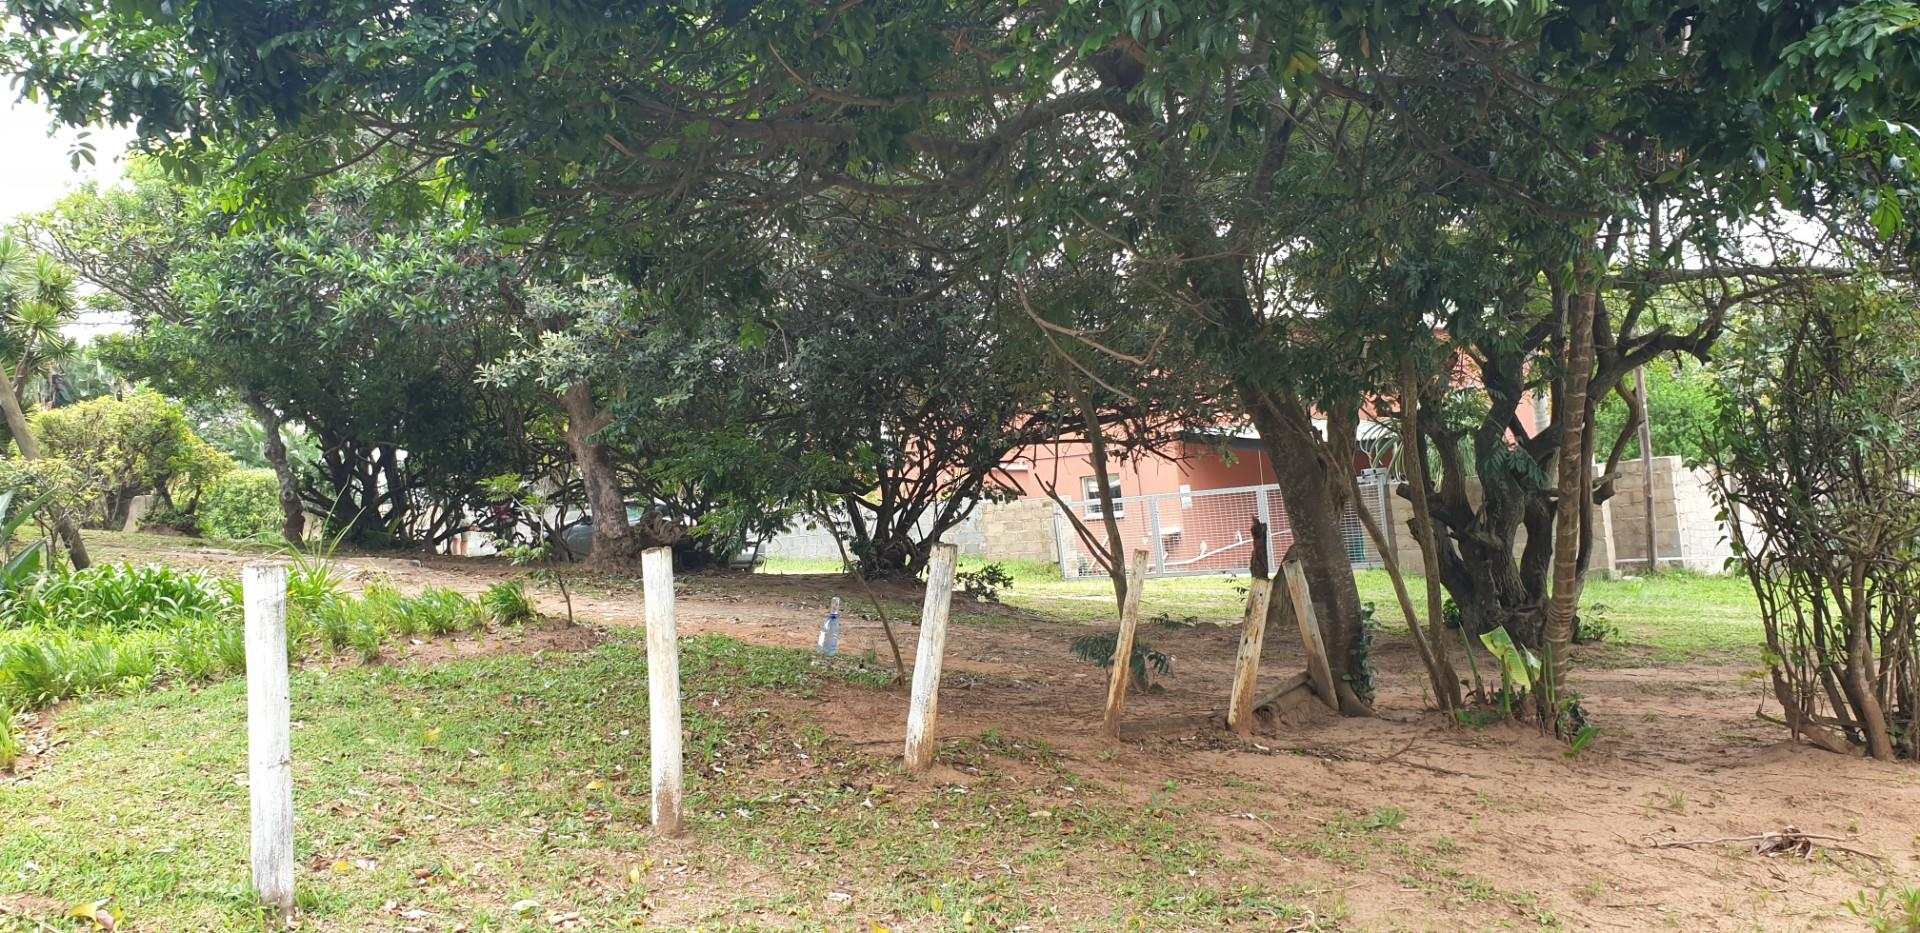 2 Bedroom House For Sale in Port Edward